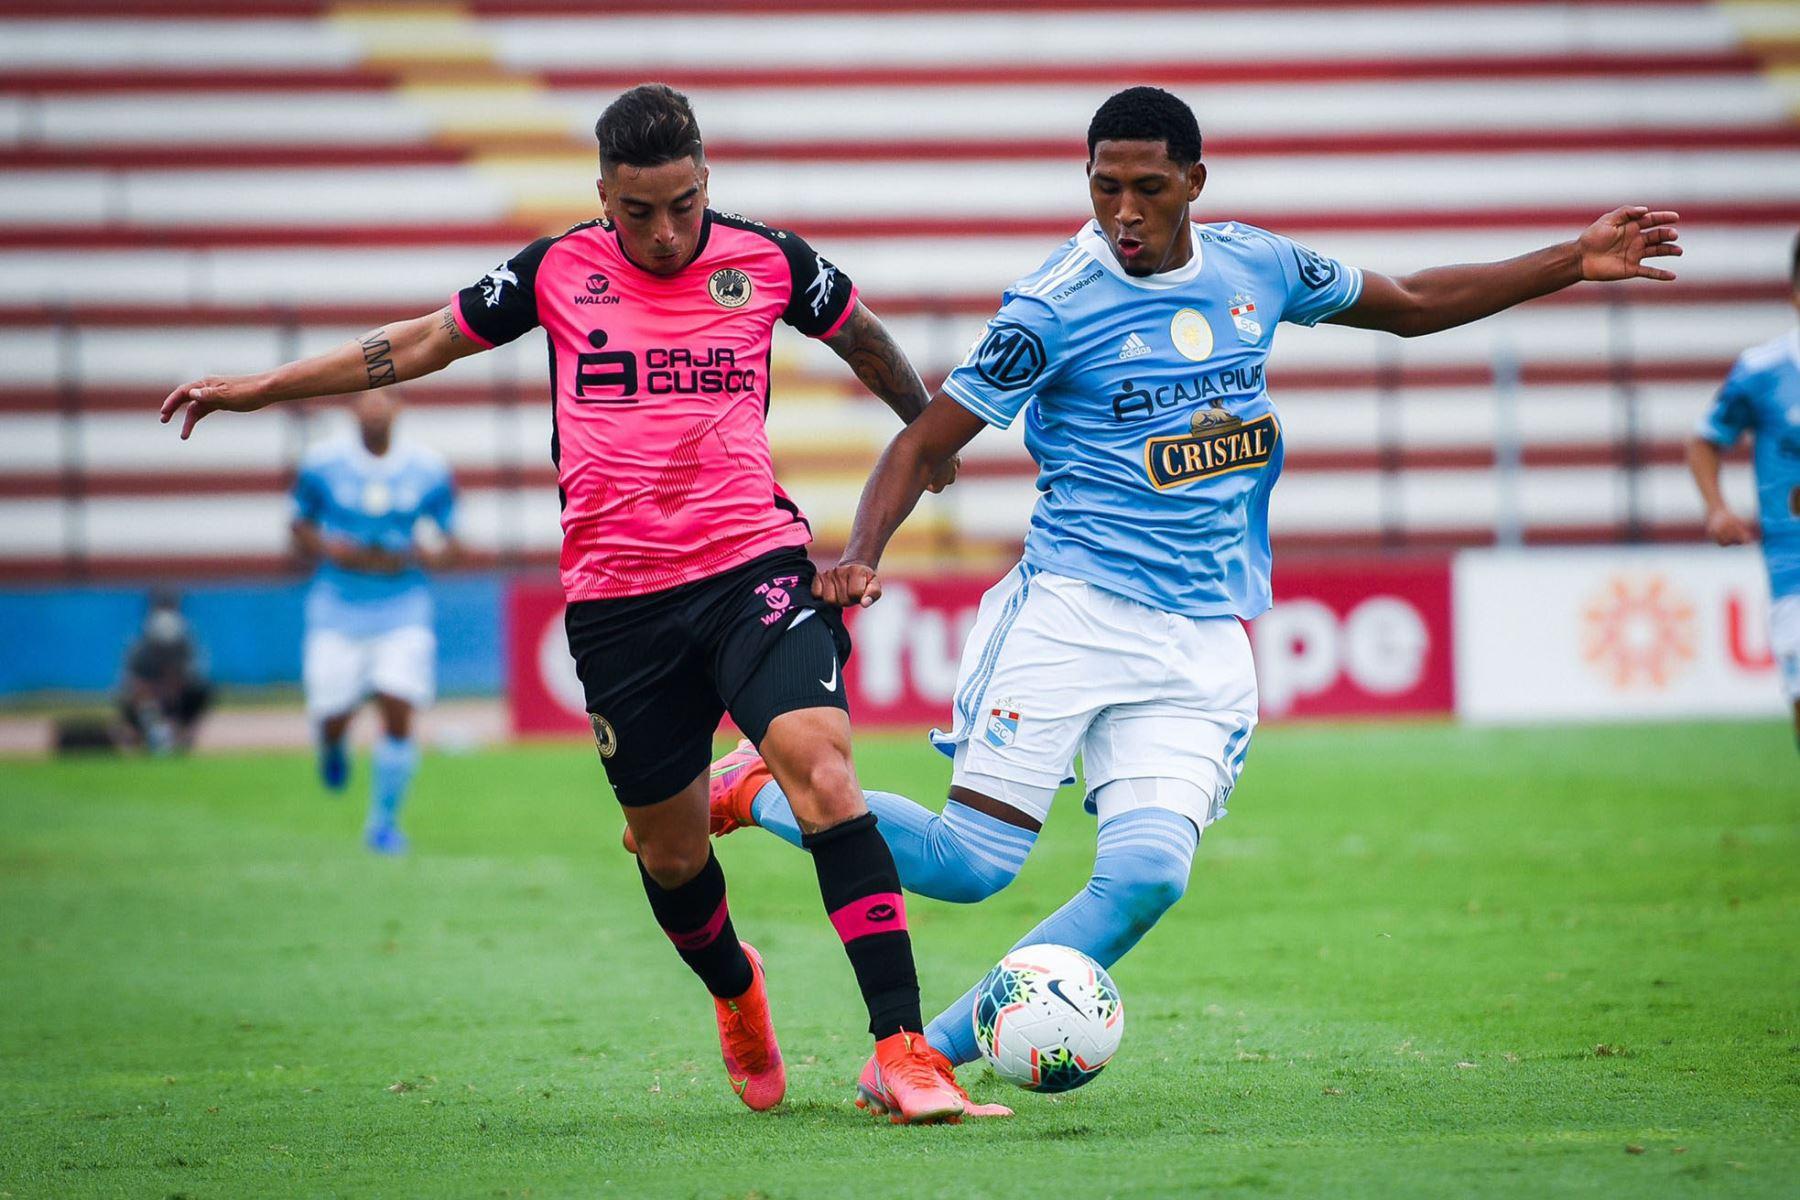 Cusco F.C y Sporting Cristal  se enfrentan por la séptima  fecha de la fase 1, en el estadio Miguel Grau .  Foto: @LigaFutProf